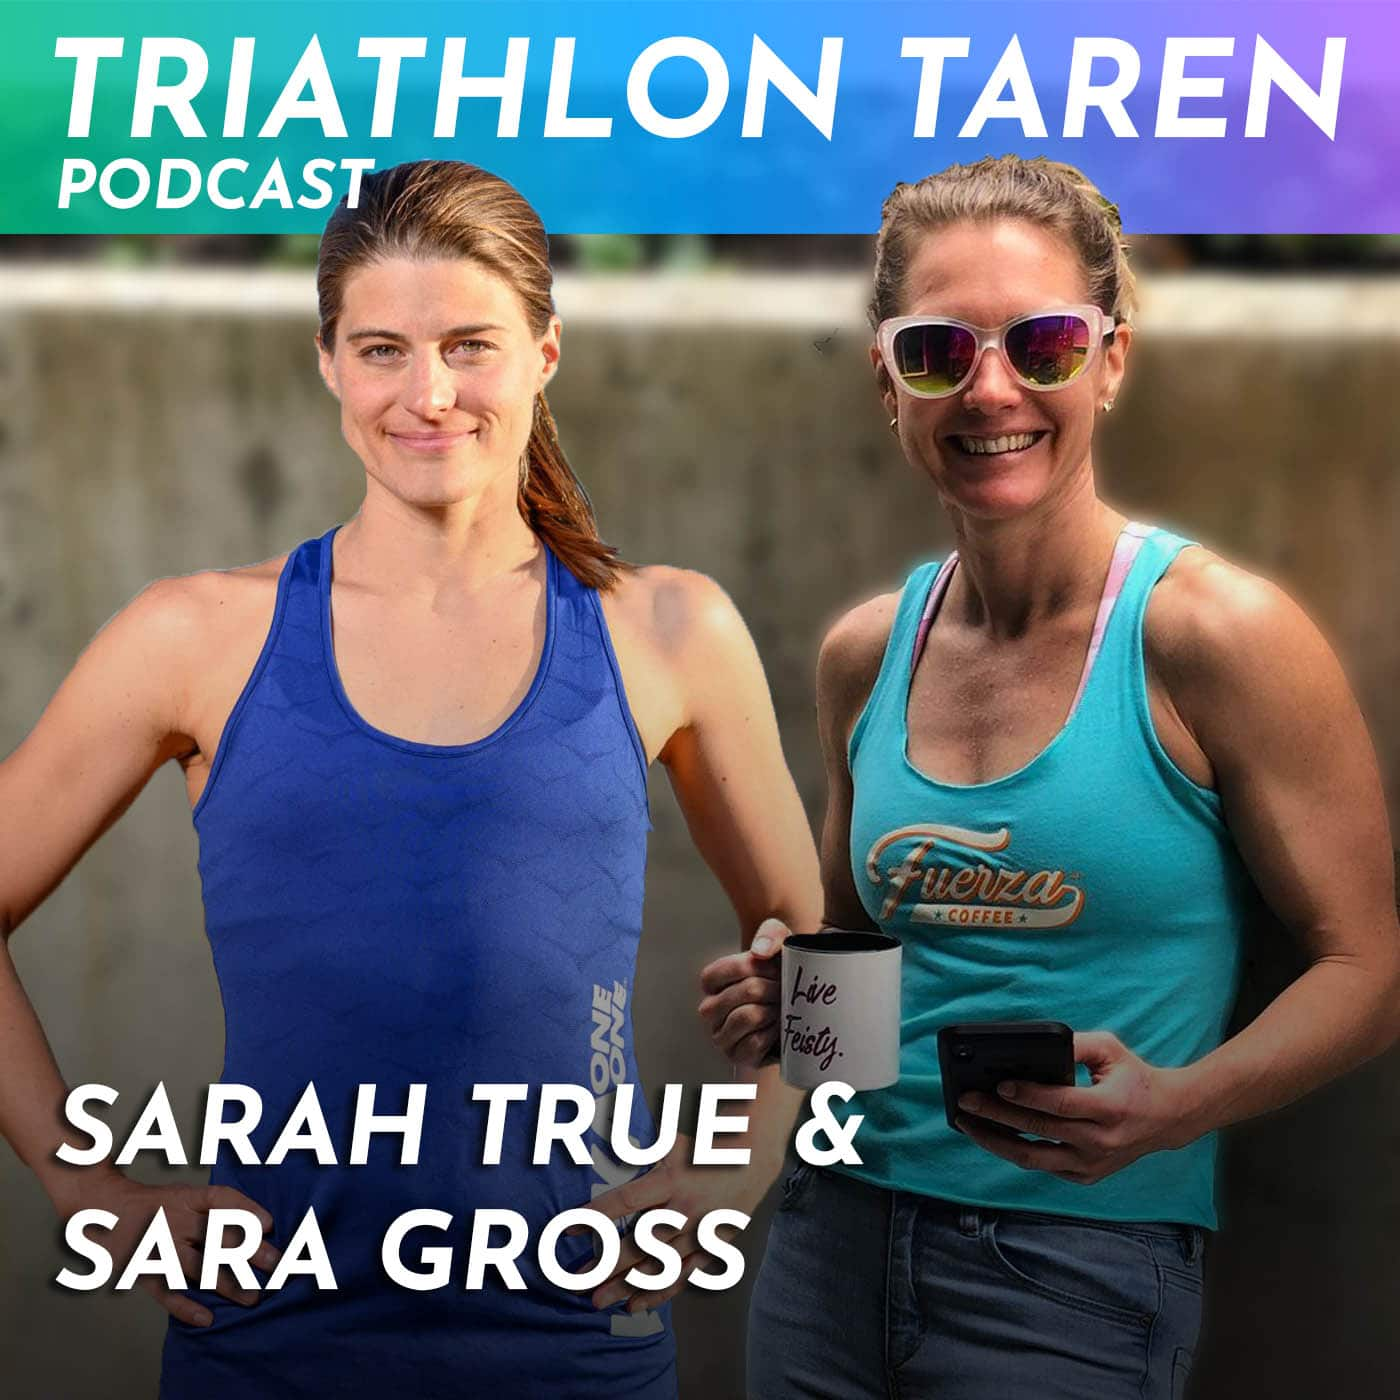 Sarah True & Sara Gross